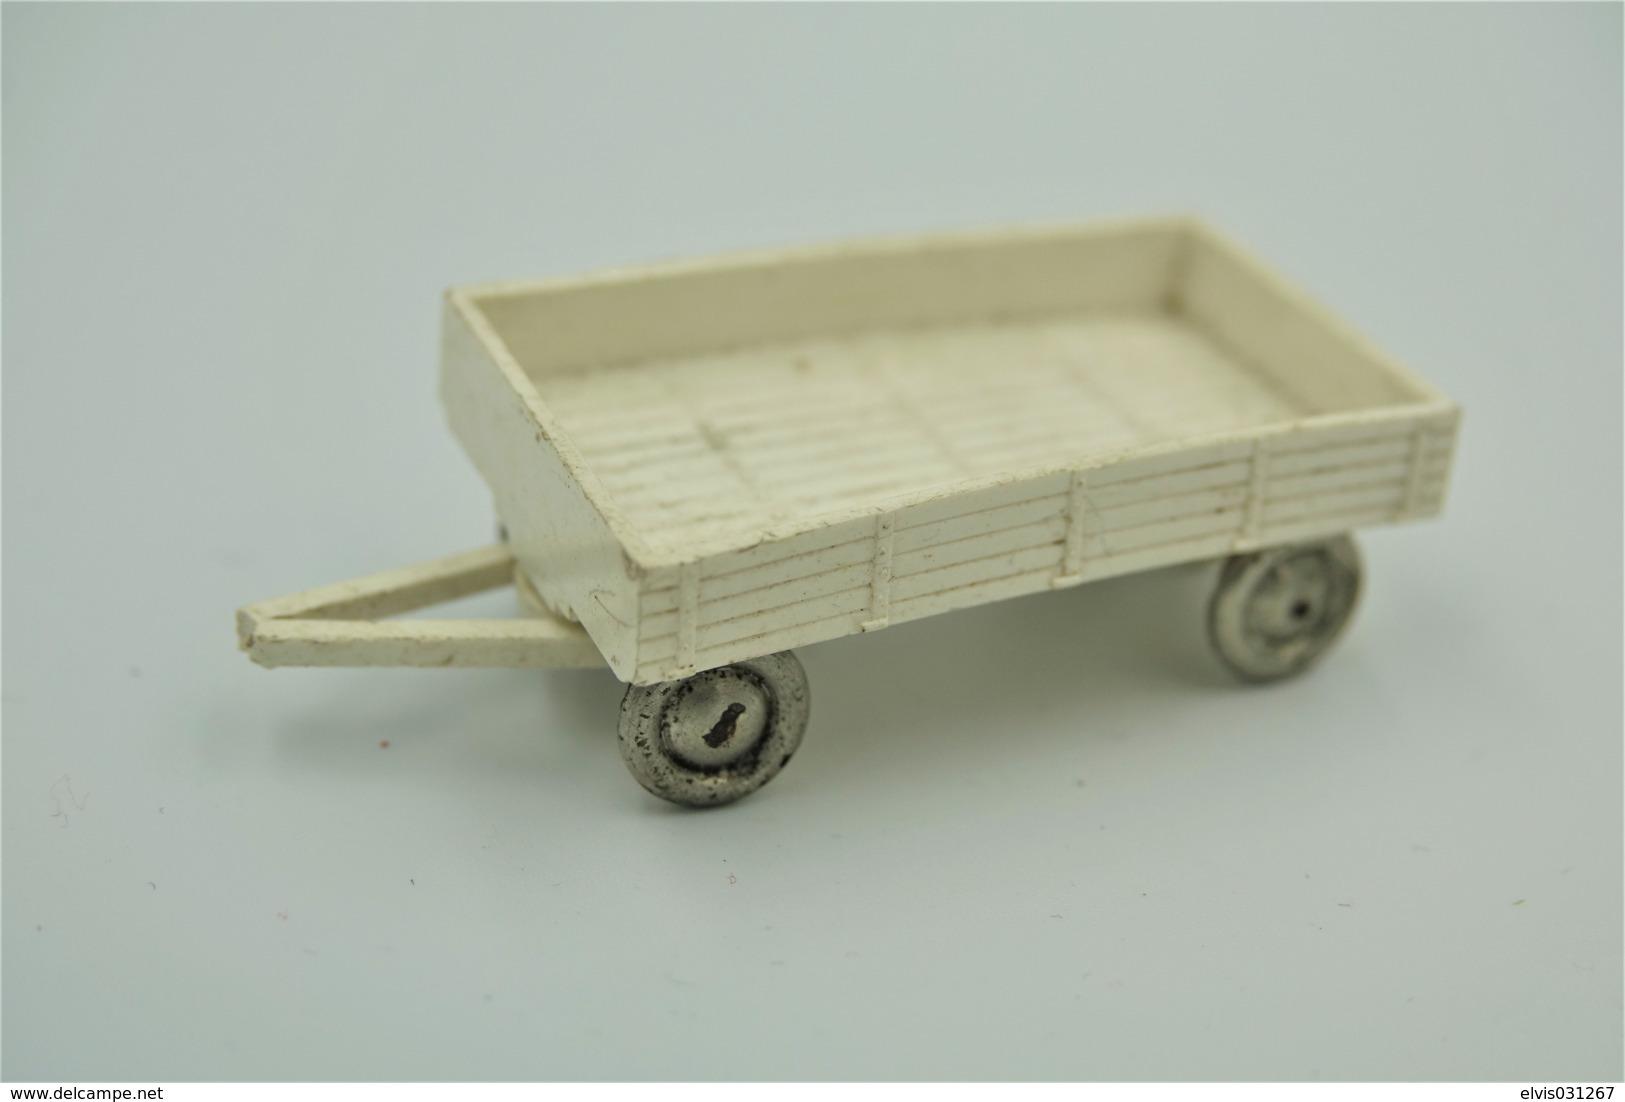 LEGO - 1:87HO Scale, Bedford Flatbed Trailer For Parts/repair - Original Lego 1955 - 1958  - Vintage - Car - Catalogs